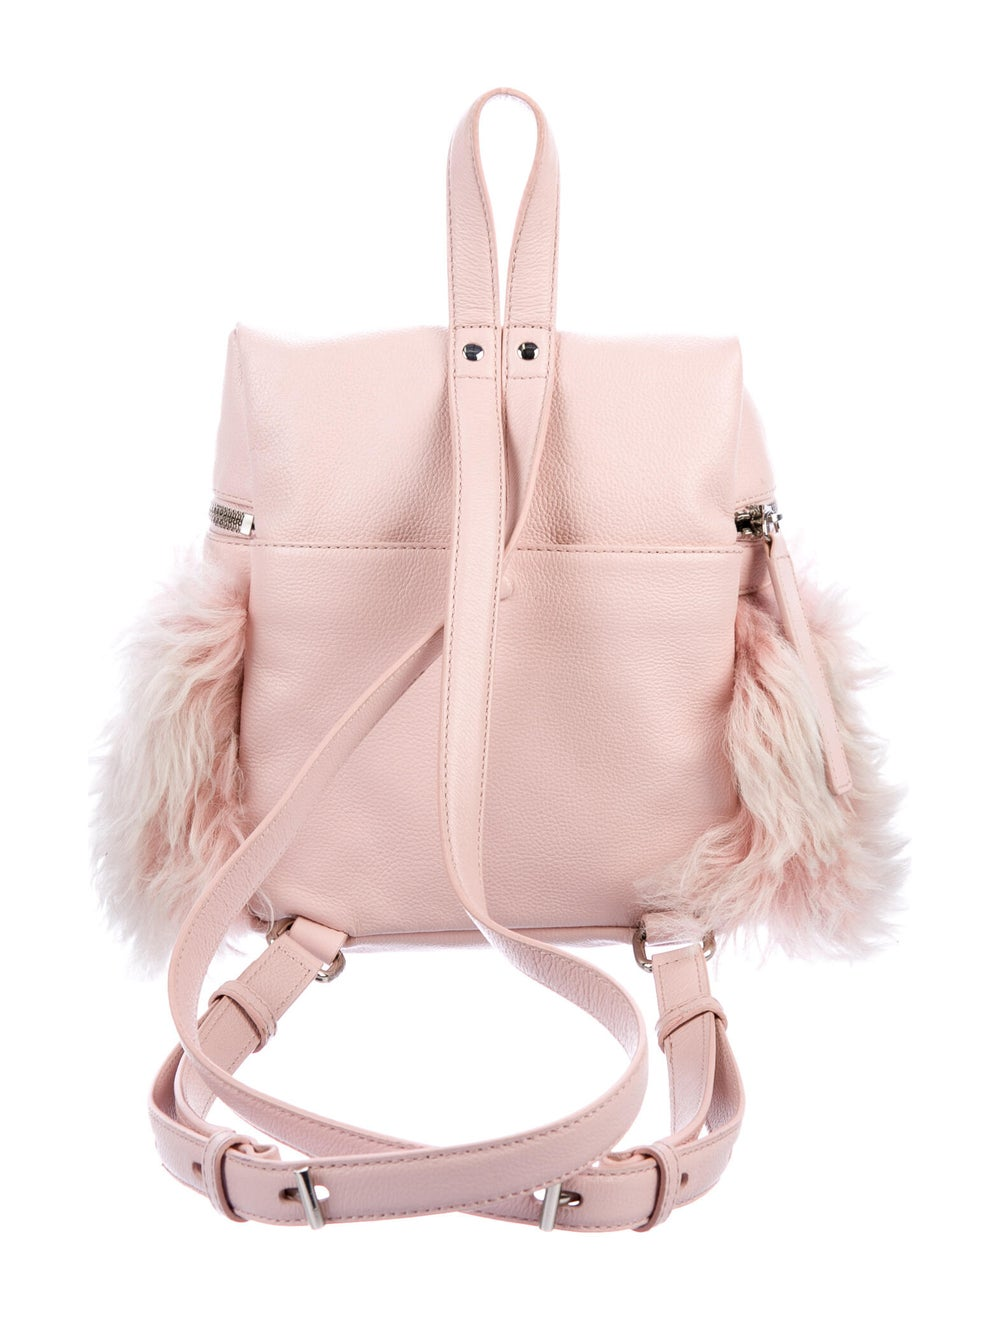 Kara Grained Leather Backpack Pink - image 4